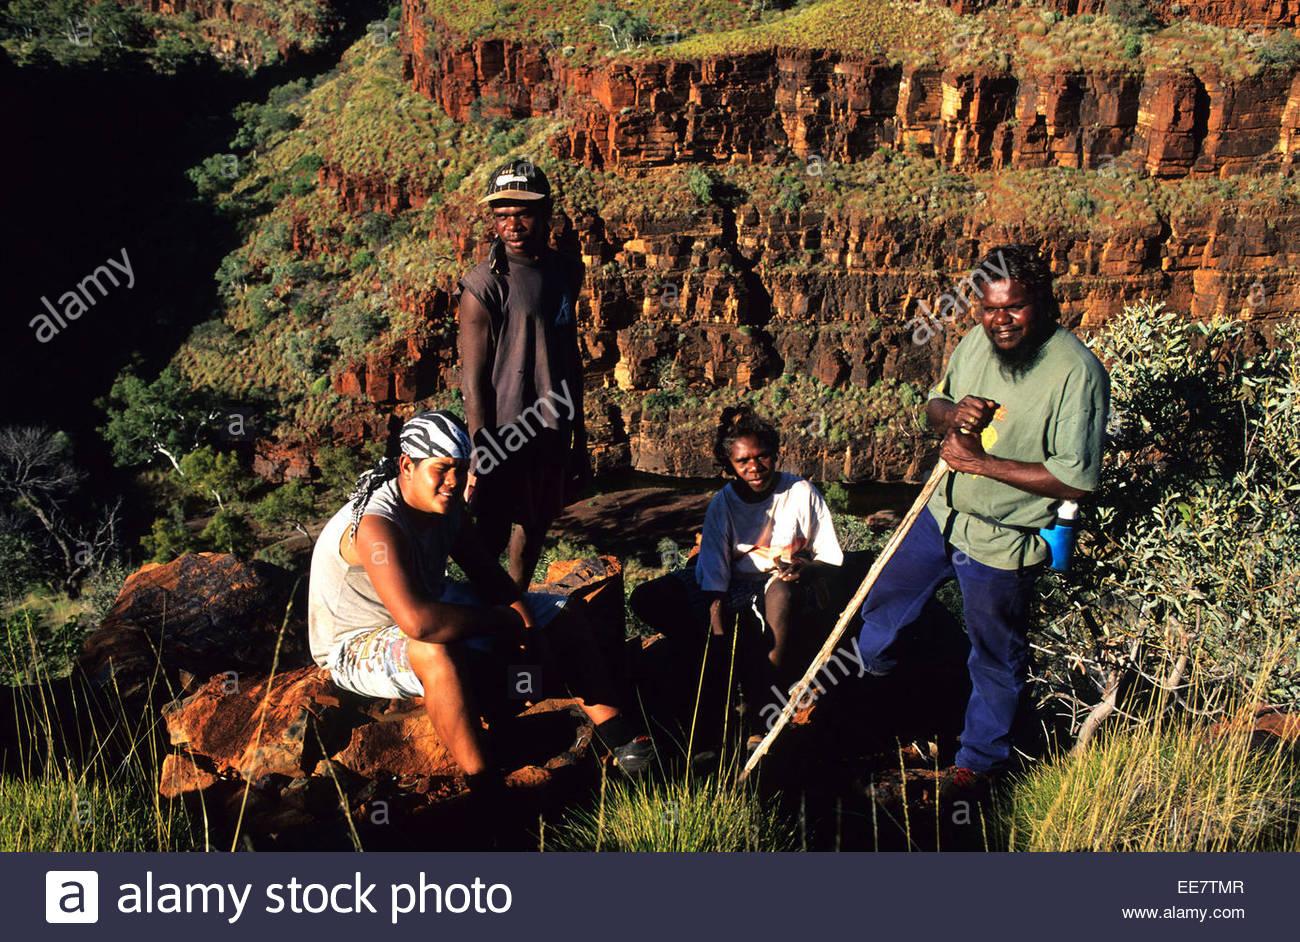 Aboriginals hikers and guides having a rest, Karijini National Park, Australia. - Stock Image